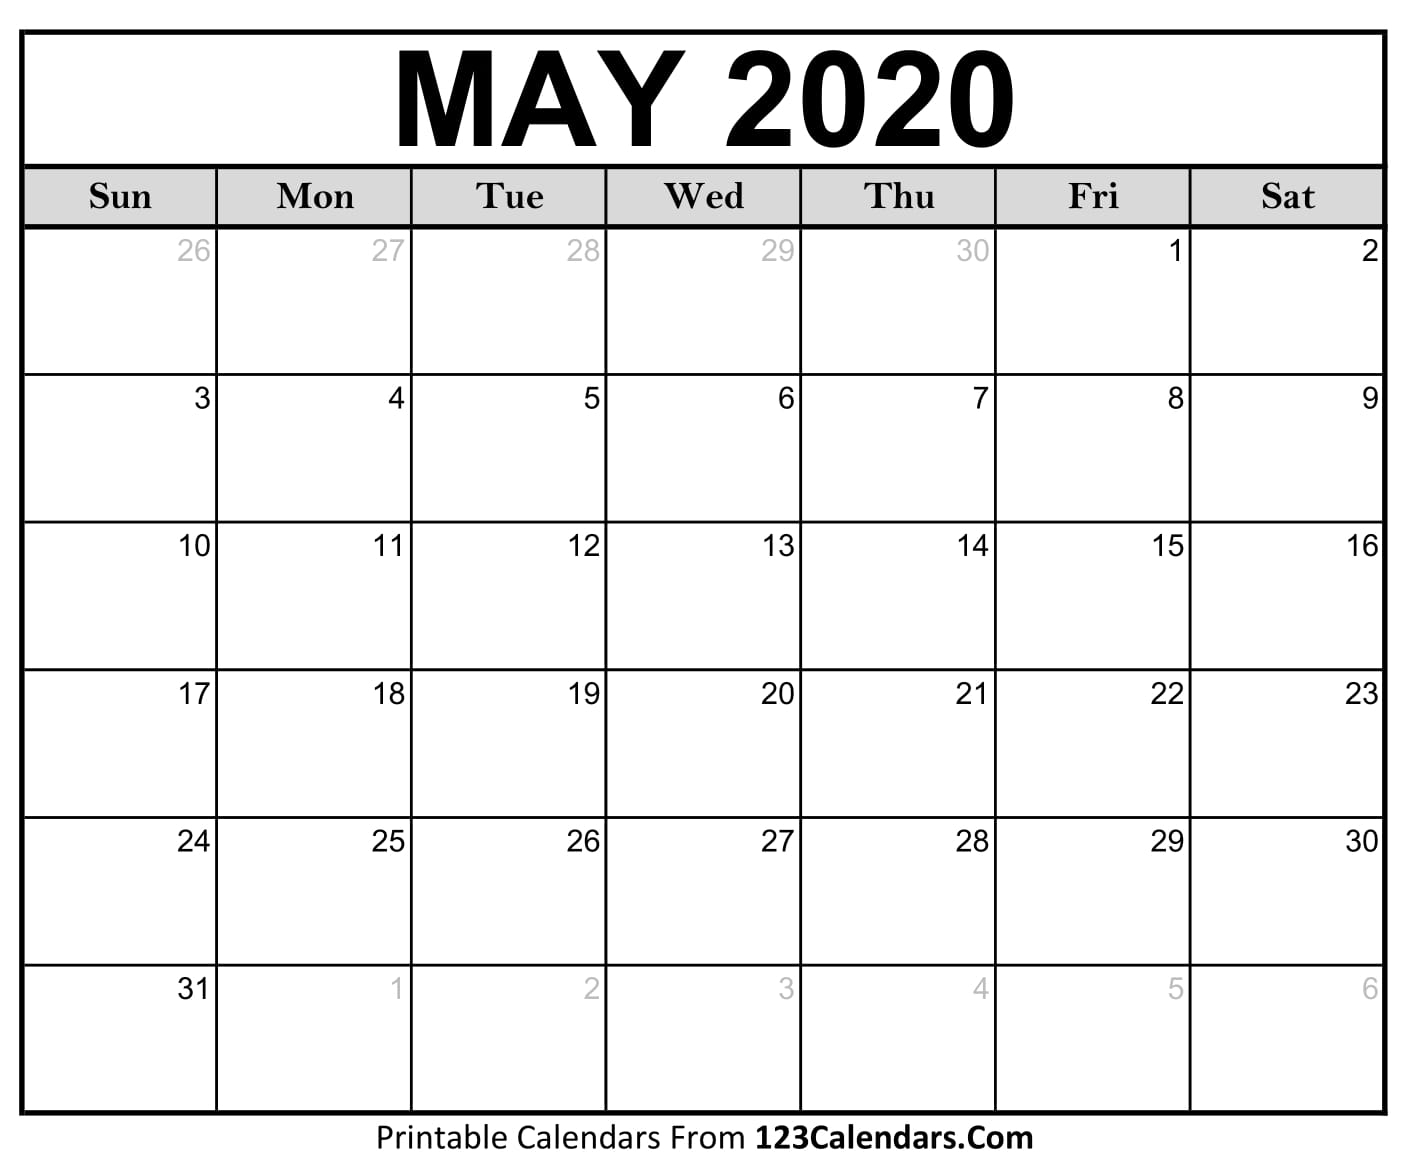 May 2020 Printable Calendar | 123Calendars with regard to Printable Calendars From 123Calendars